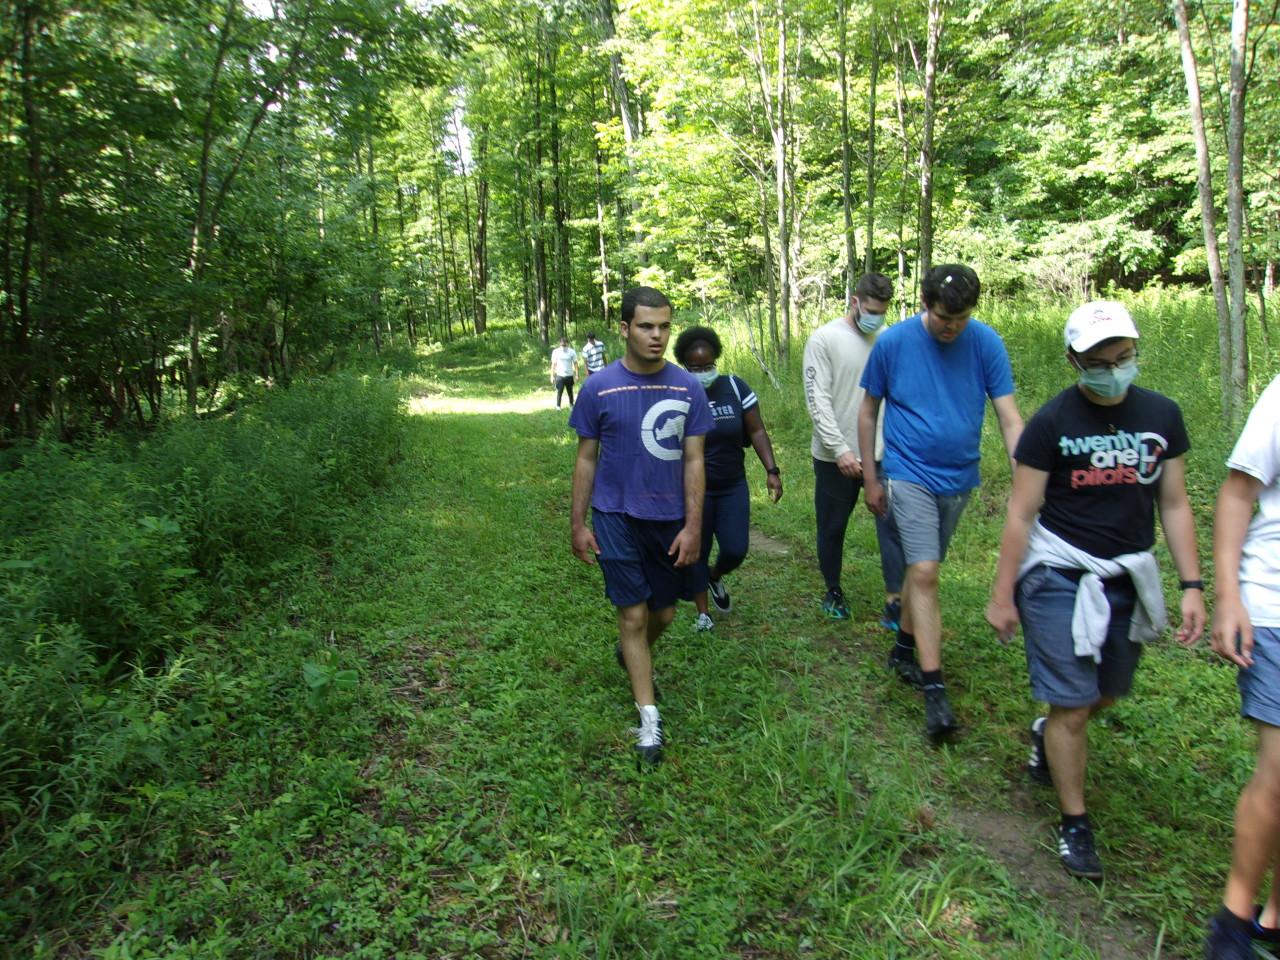 MainCampusTrail3 - Hitting the Trail - Take a Look Tuesday